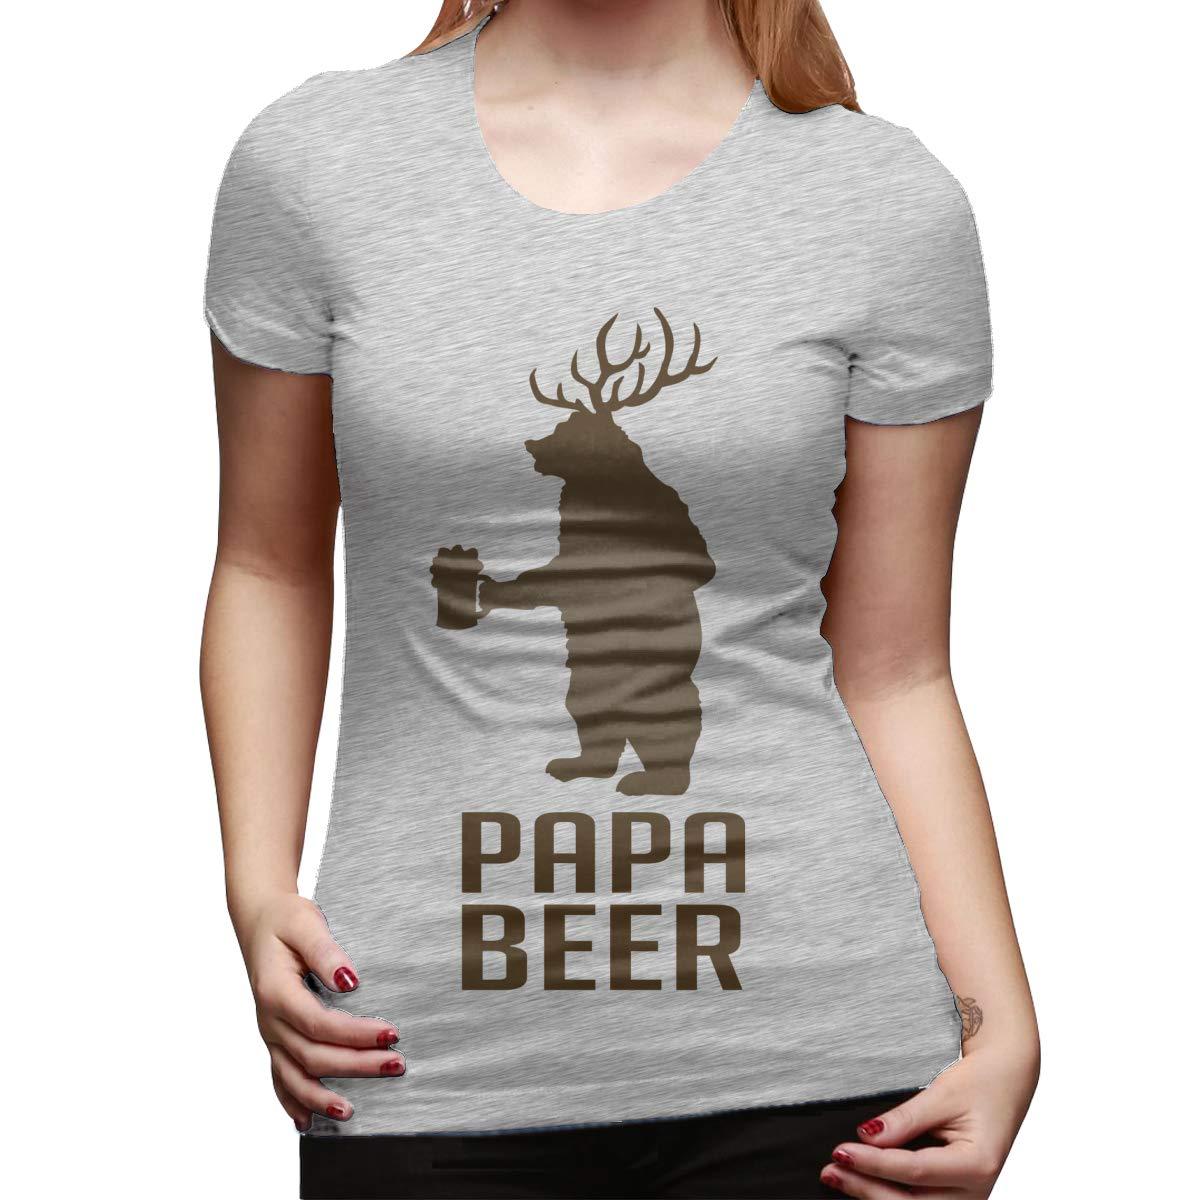 Kian Personalized Tee Papa Beer Bear Short Sleeve Cool Tshirts Black